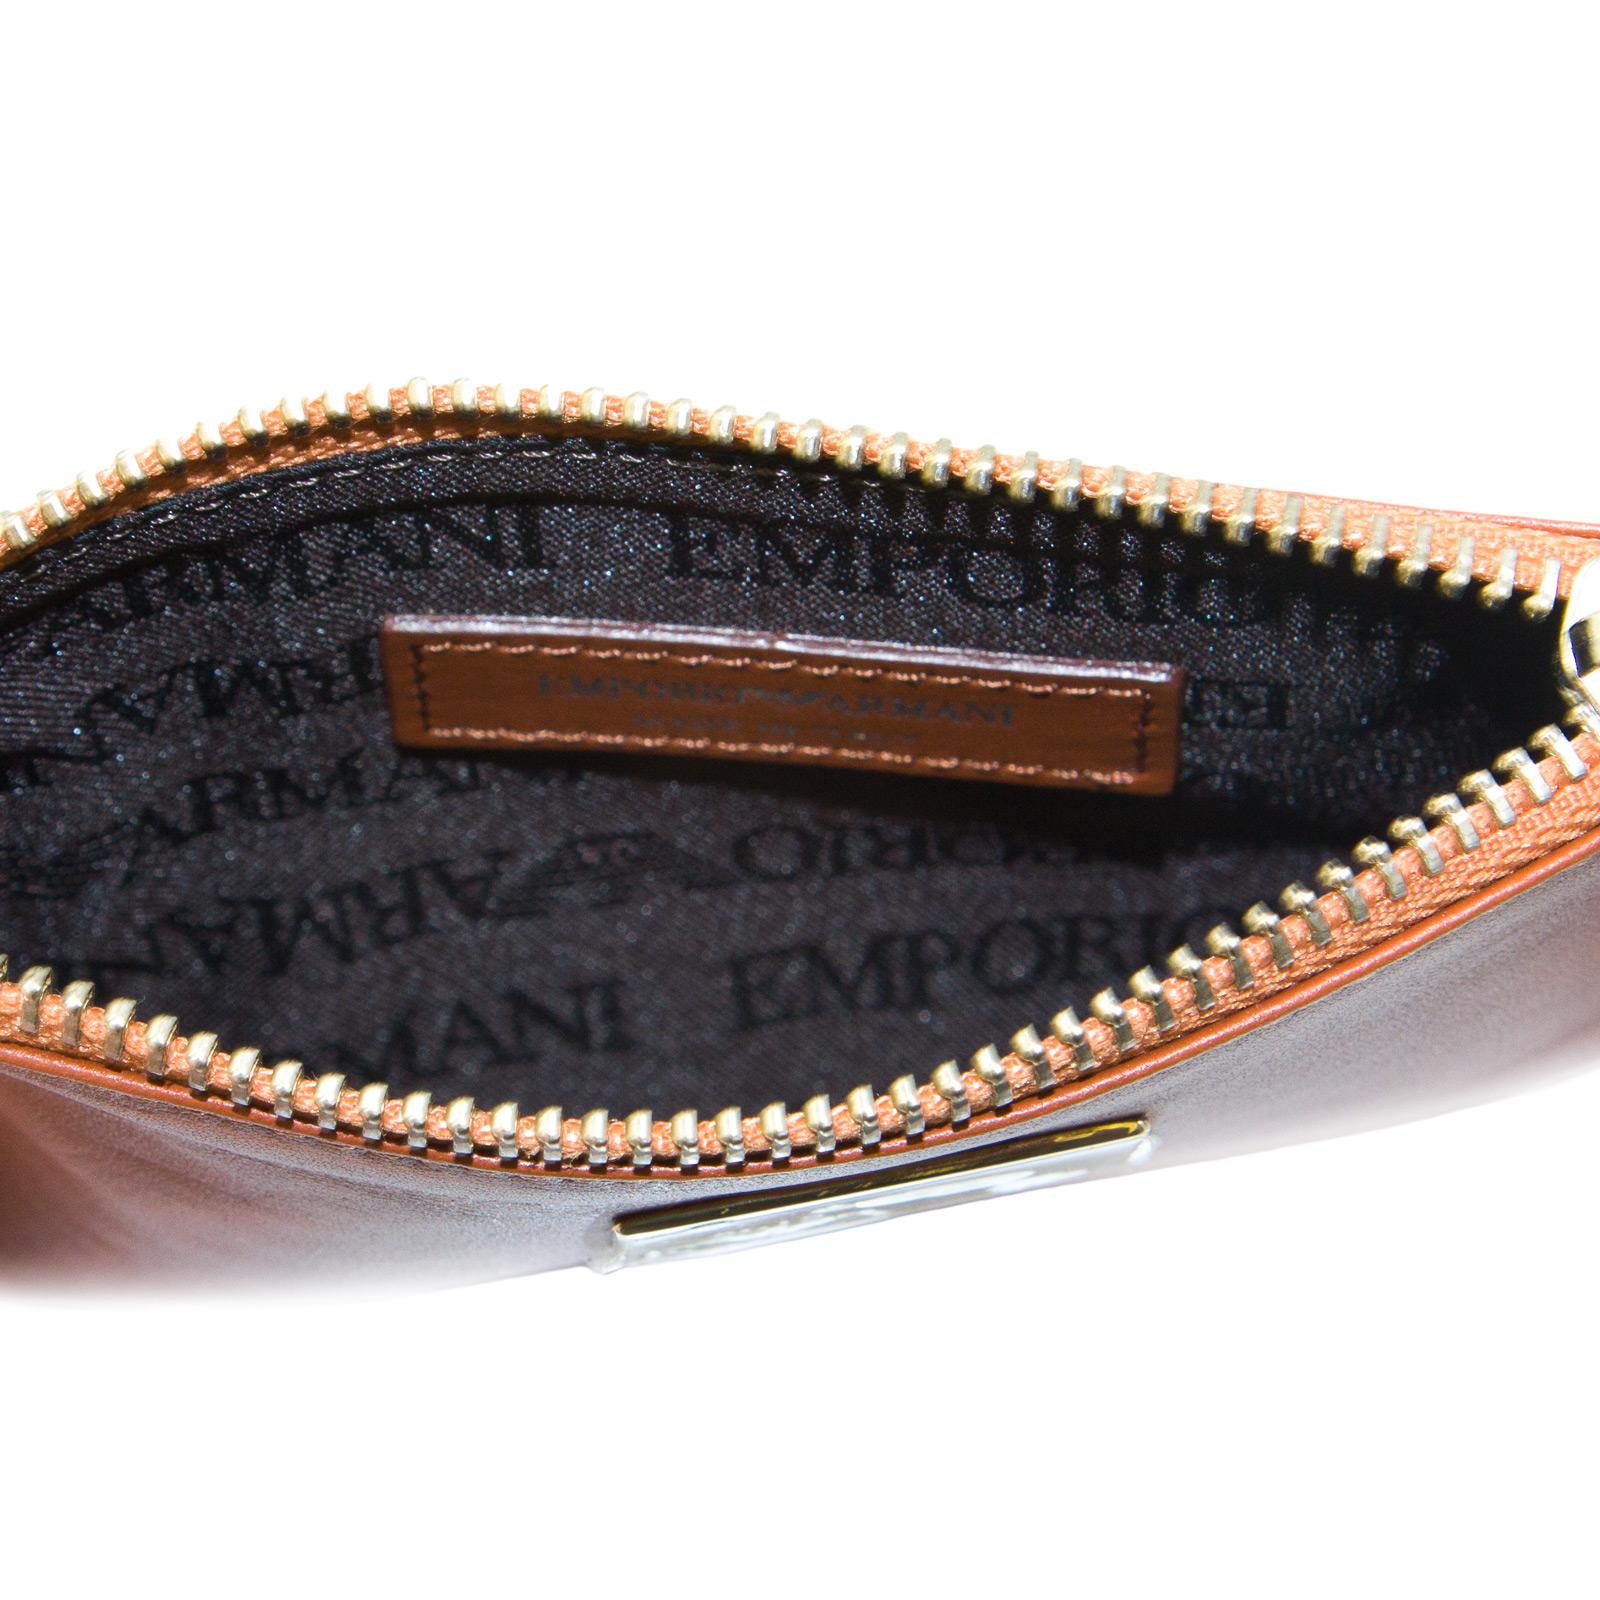 EMPORIO-ARMANI-Women-039-s-034-2012-034-Zip-Top-Coin-Purse-Wallet-YEMG99-195-NWT thumbnail 10